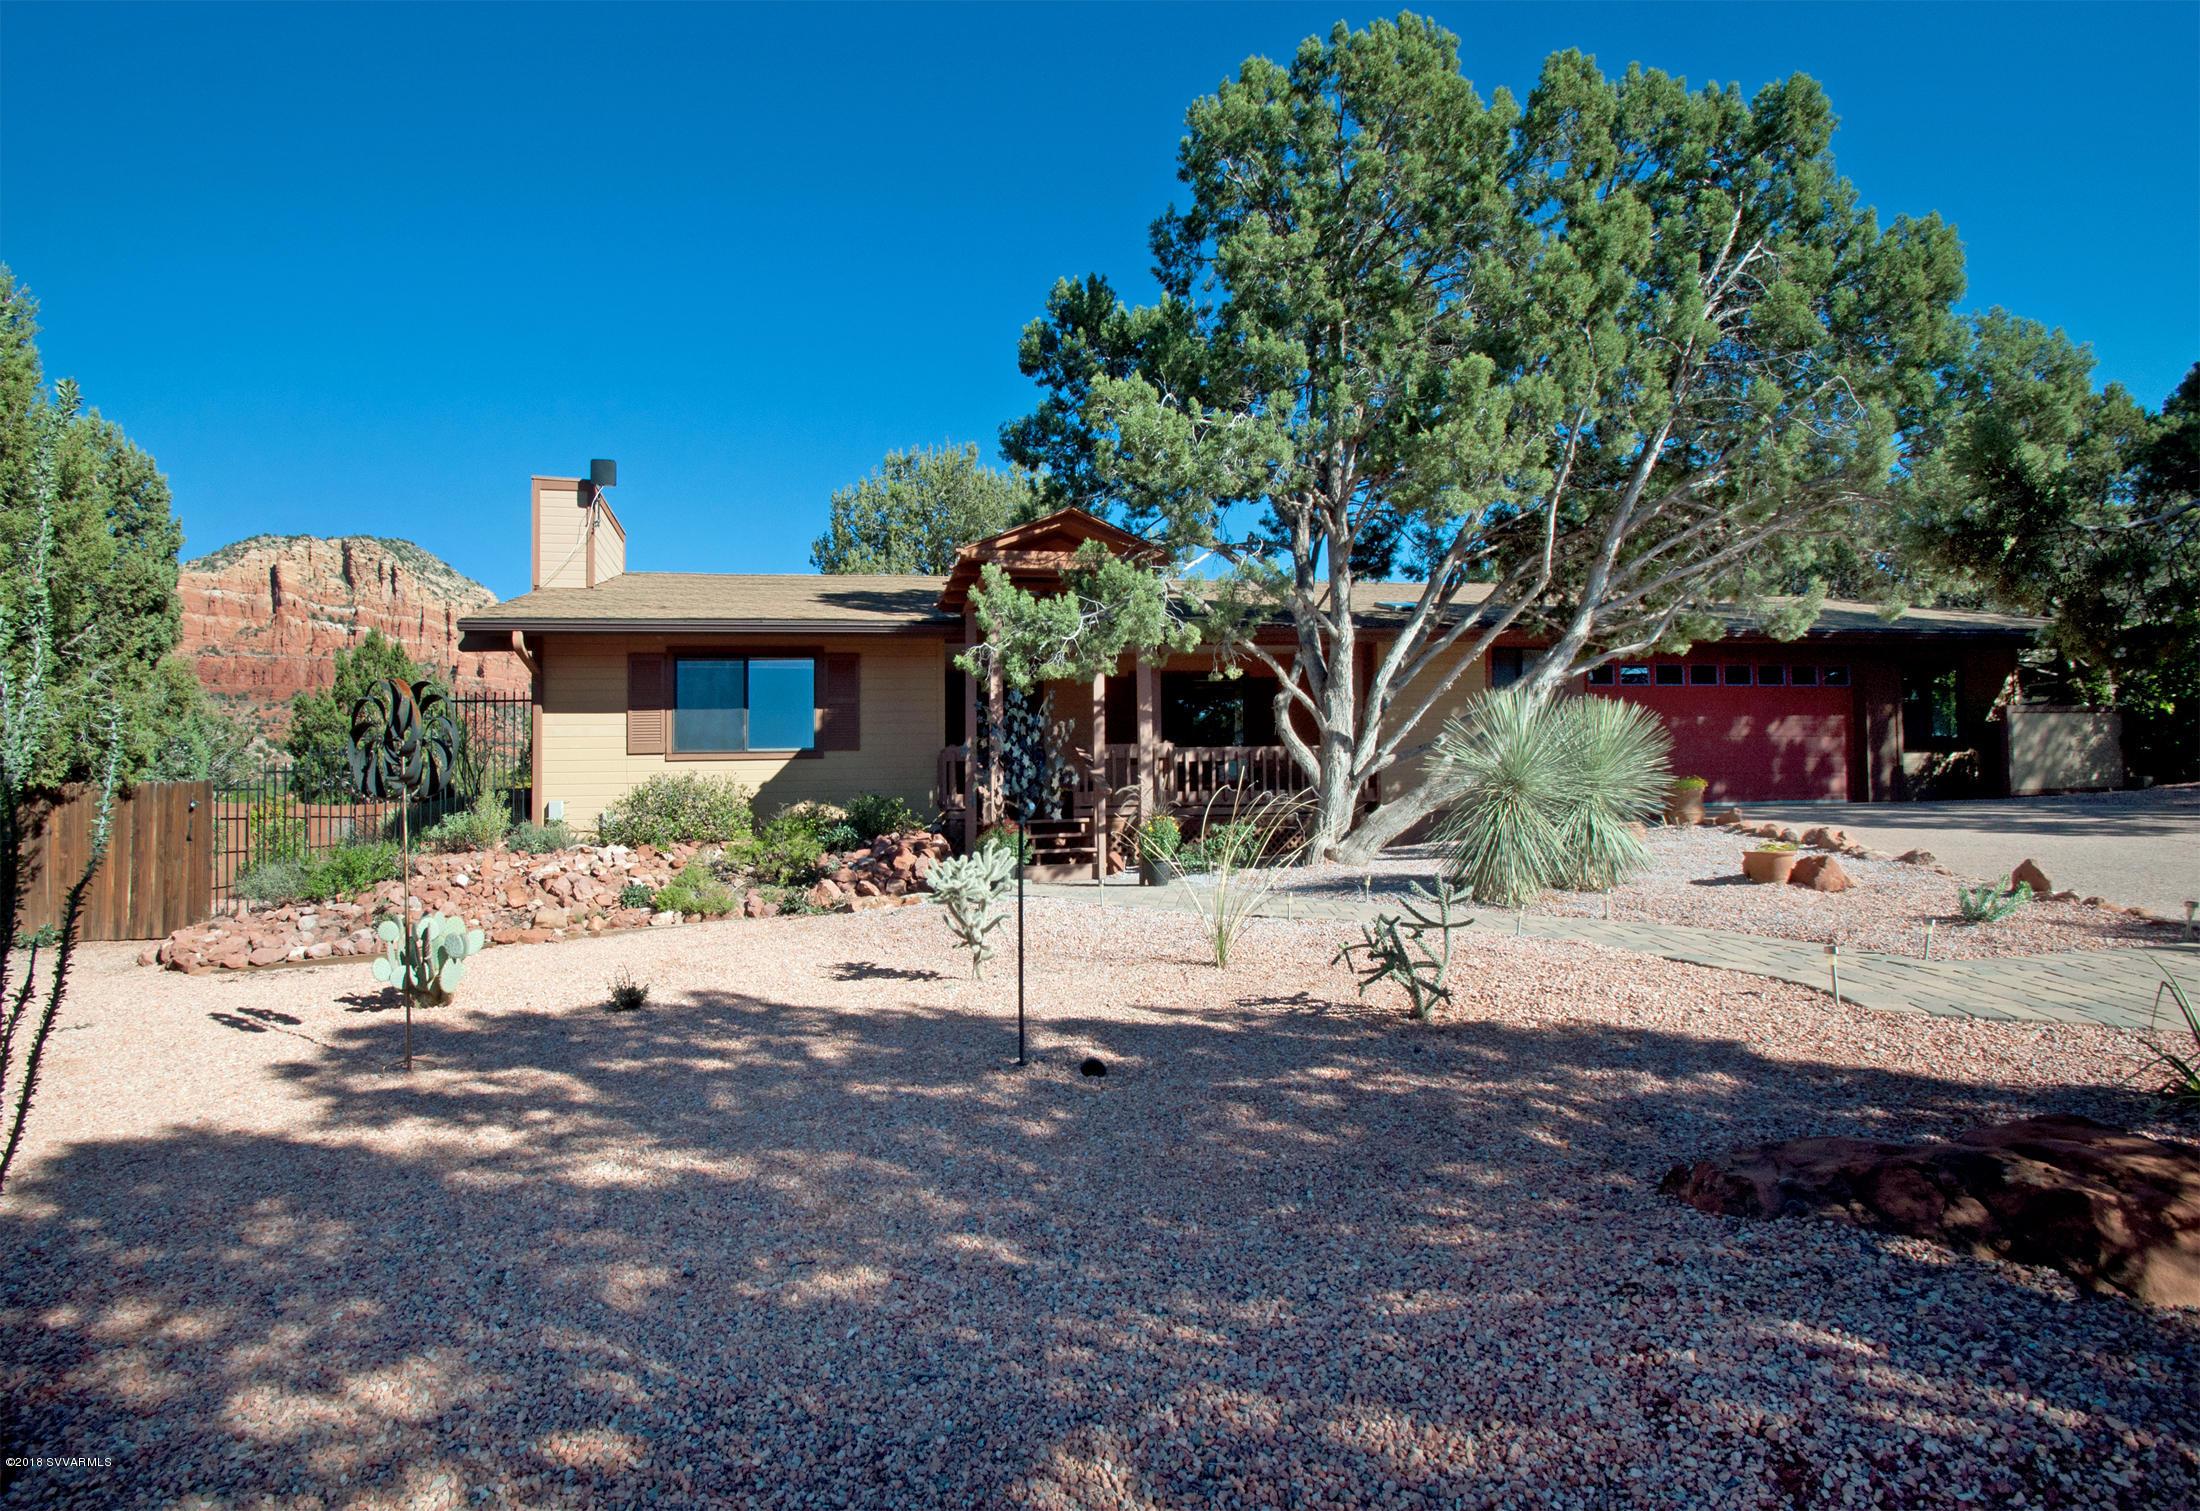 150 Fawn Drive Sedona, AZ 86336